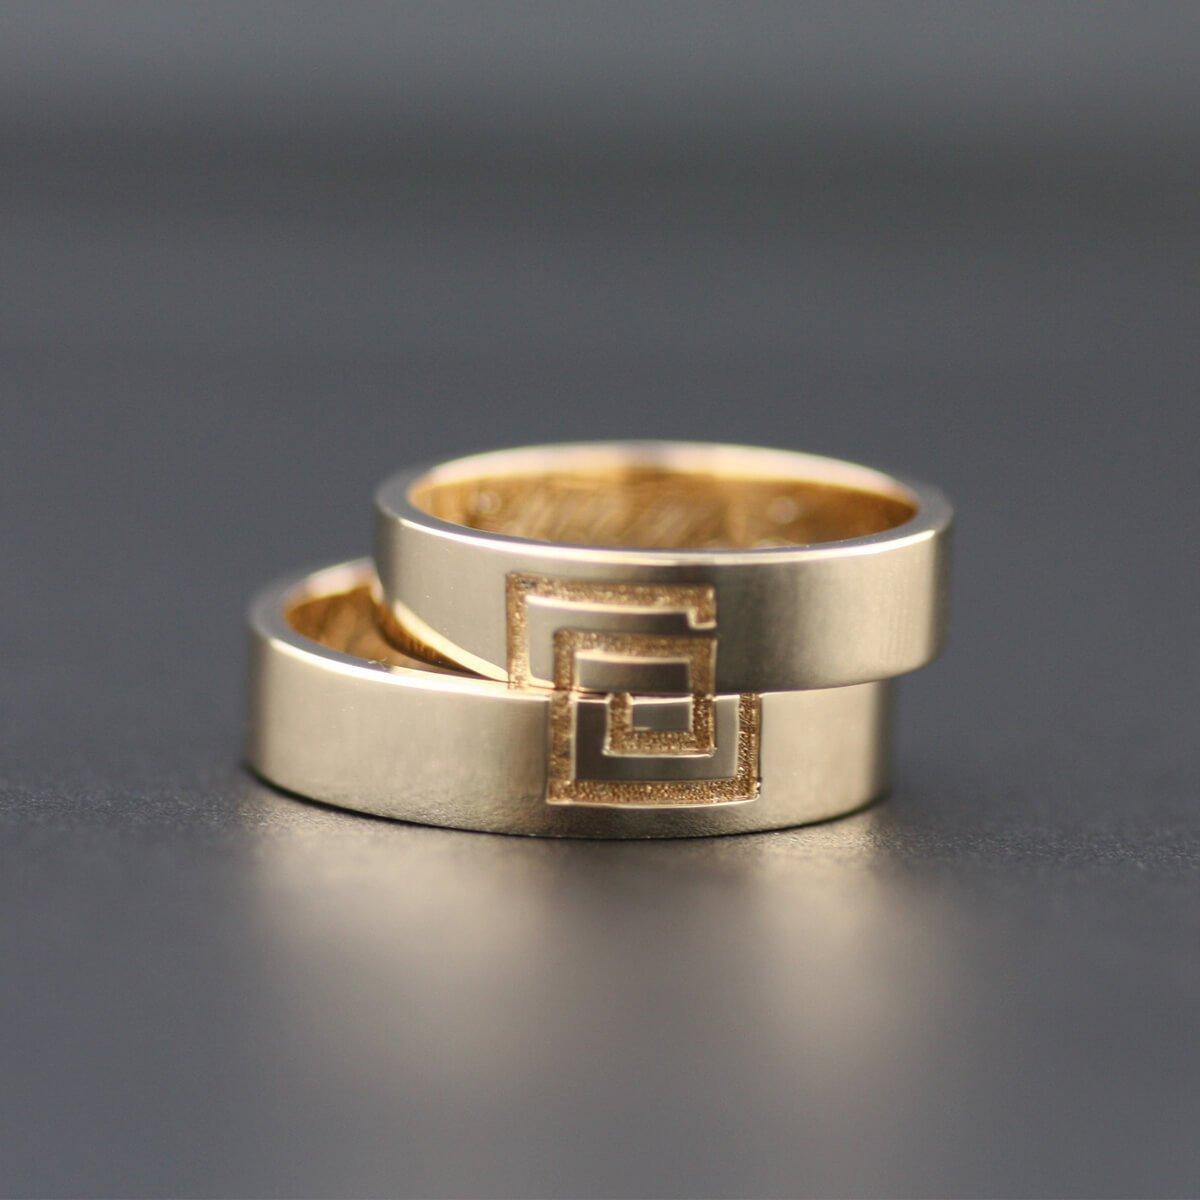 Unisex Wedding Rings